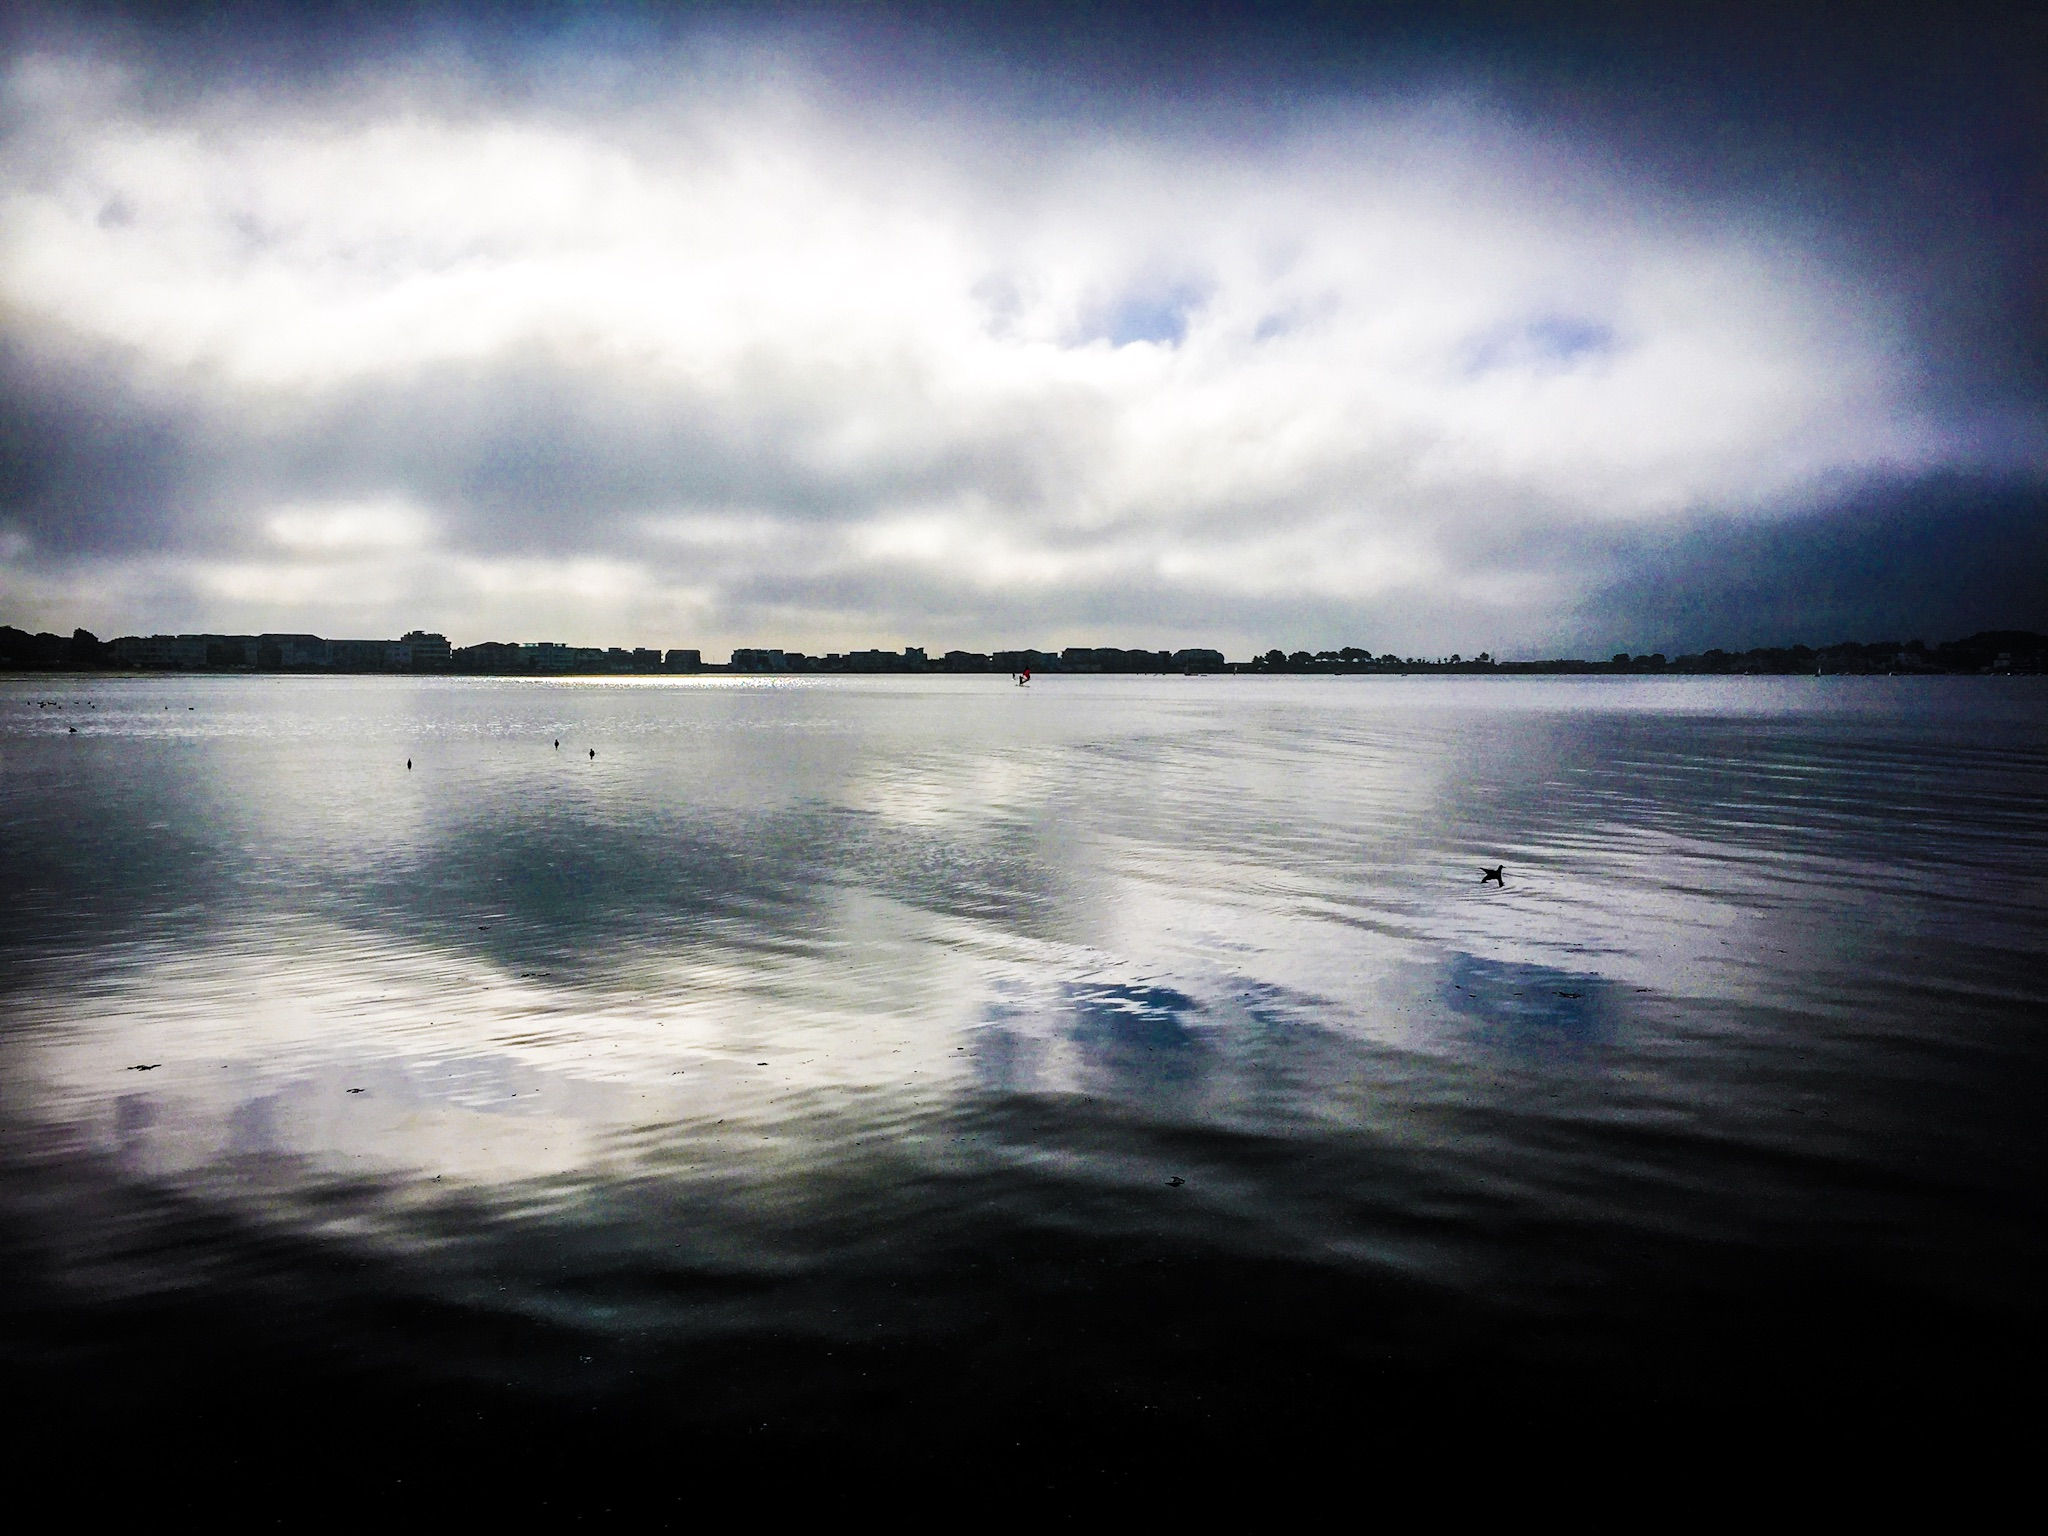 The view of Sandbanks, Poole, Dorset taken on my IPhone